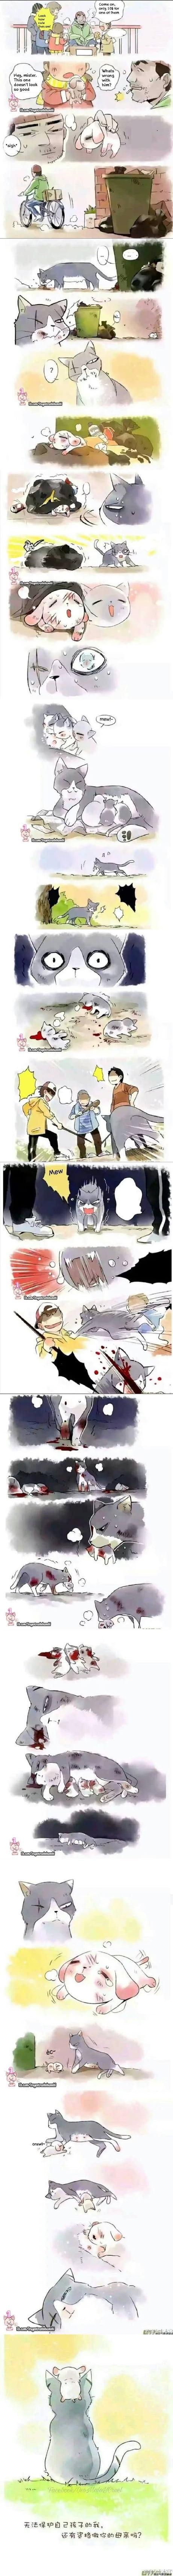 Comics Its that ninjas cutting onions time